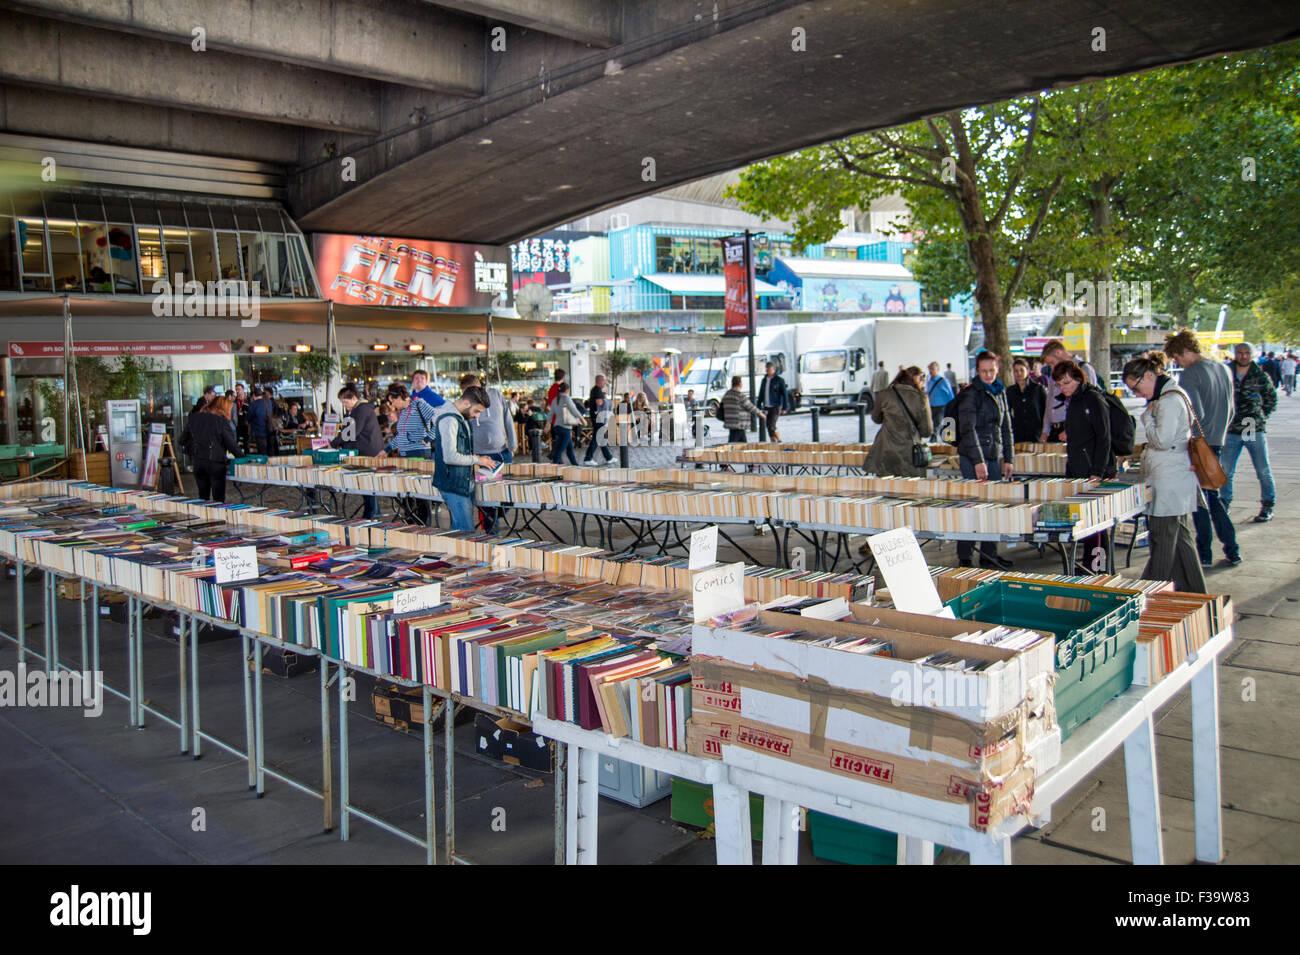 Secondhand bookstall on London's southbank under Waterloo bridge. - Stock Image